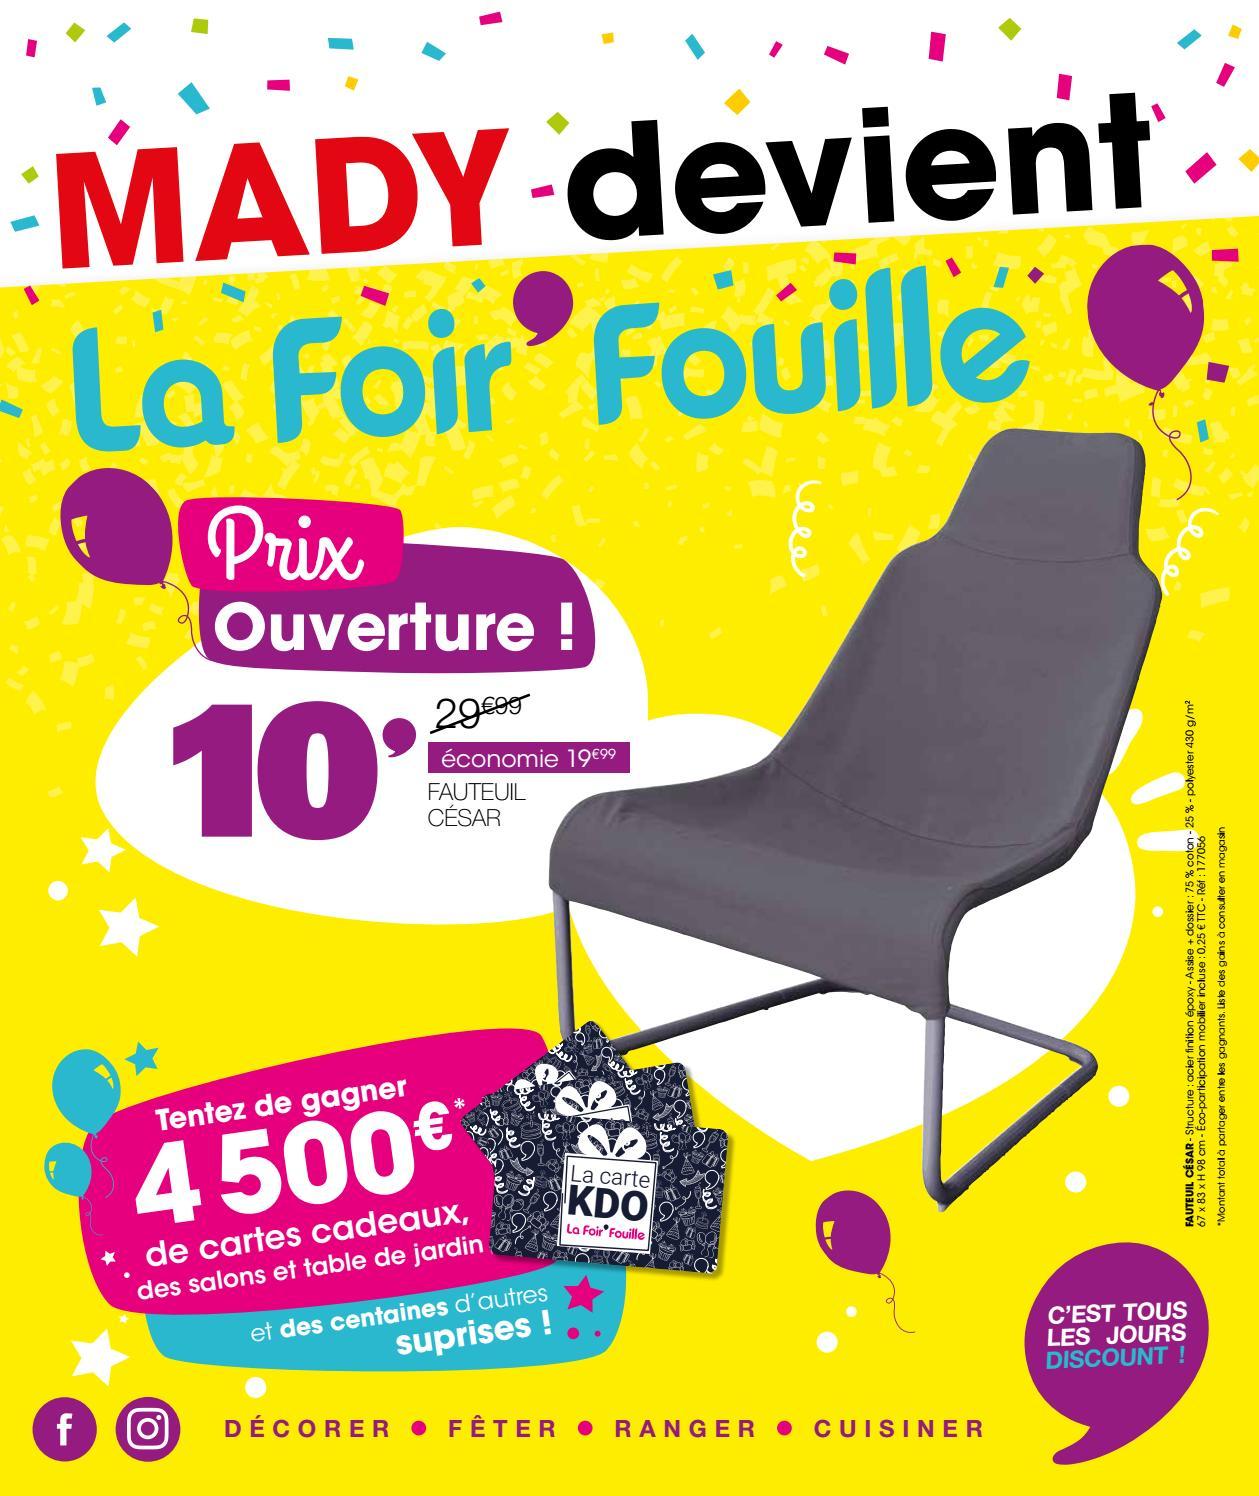 Boulogne Catalogue Post Boulogne Catalogue Boulogne Post Catalogue Ouverture Ouverture Ouverture Post 8wPZn0kXNO